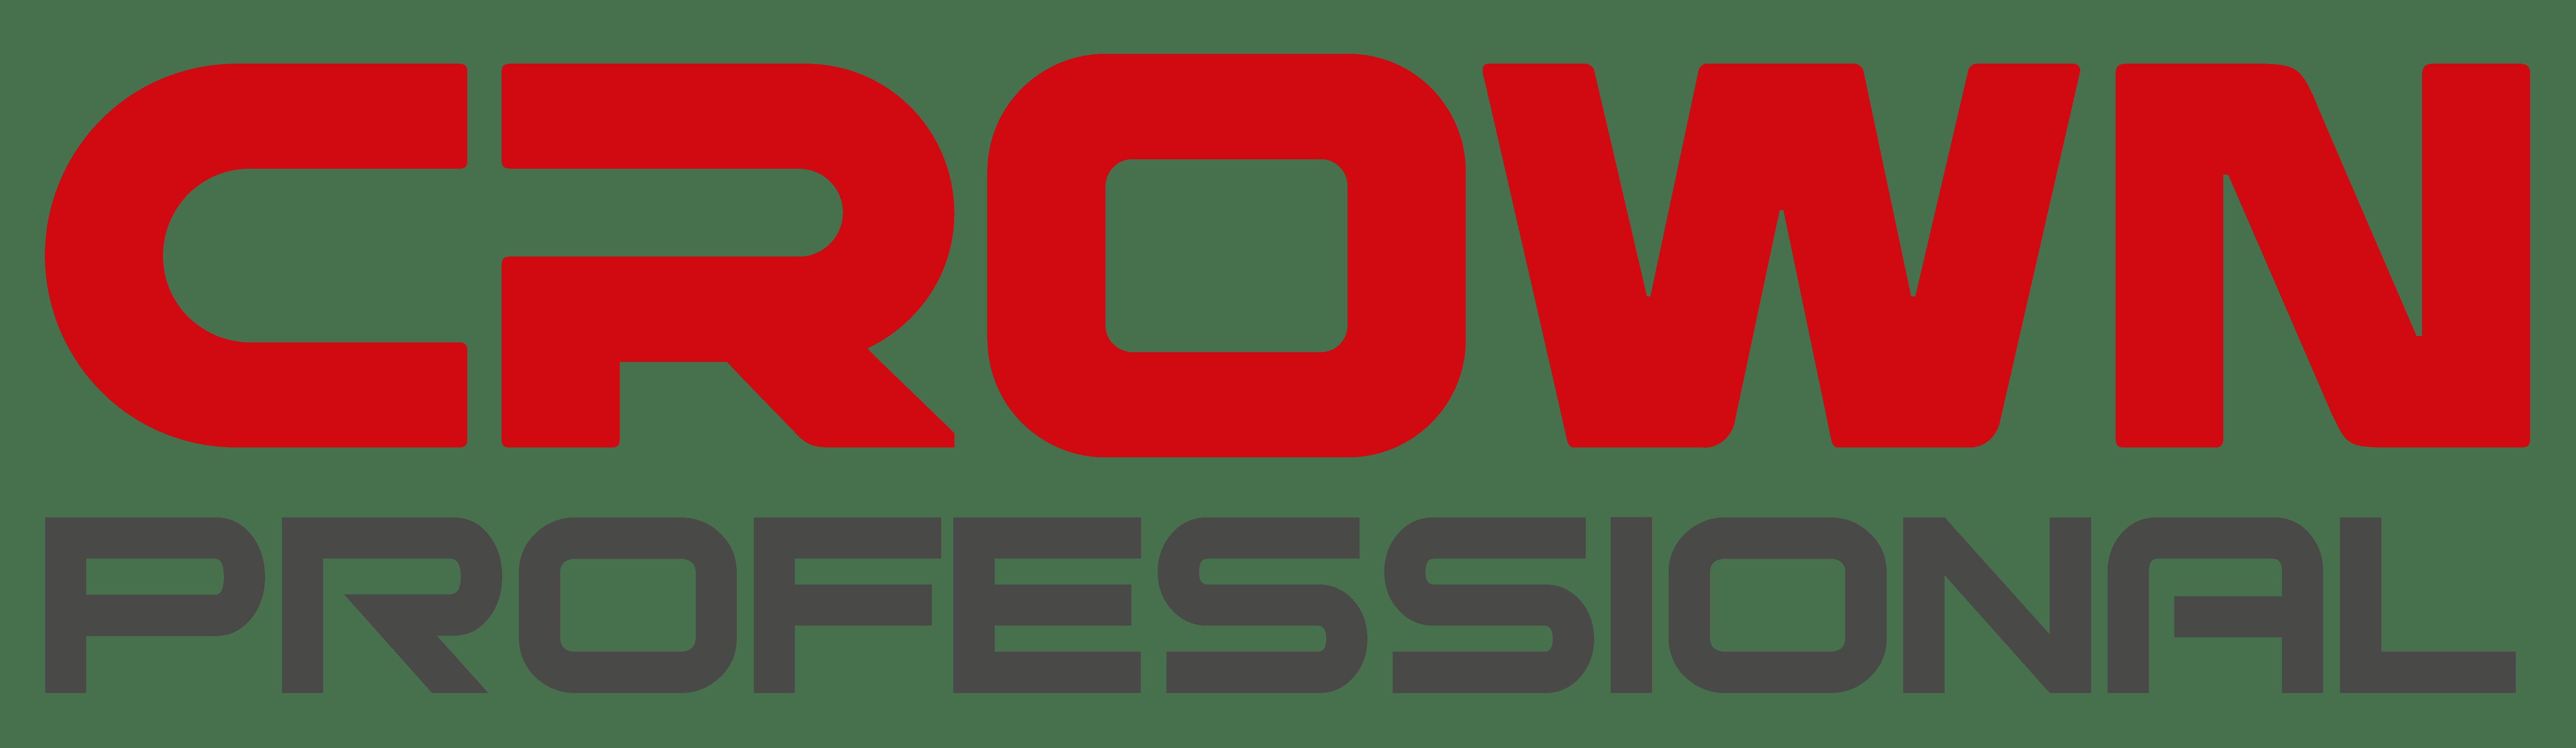 CROWN_logo_professional-01